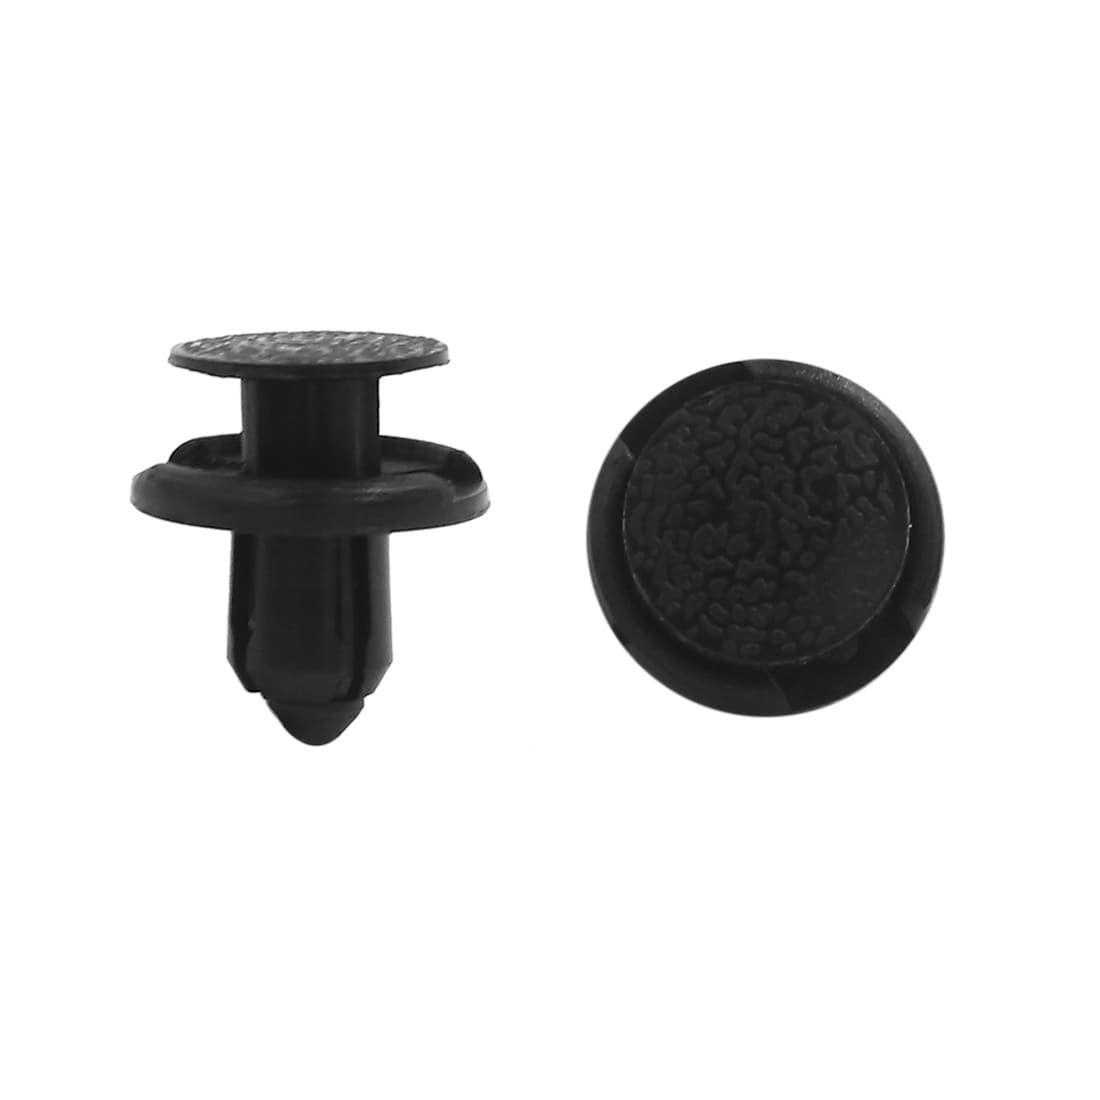 100 x 9mm Hole Dia Plastic Rivets Fastener Push Clips Black for Car Auto Fender